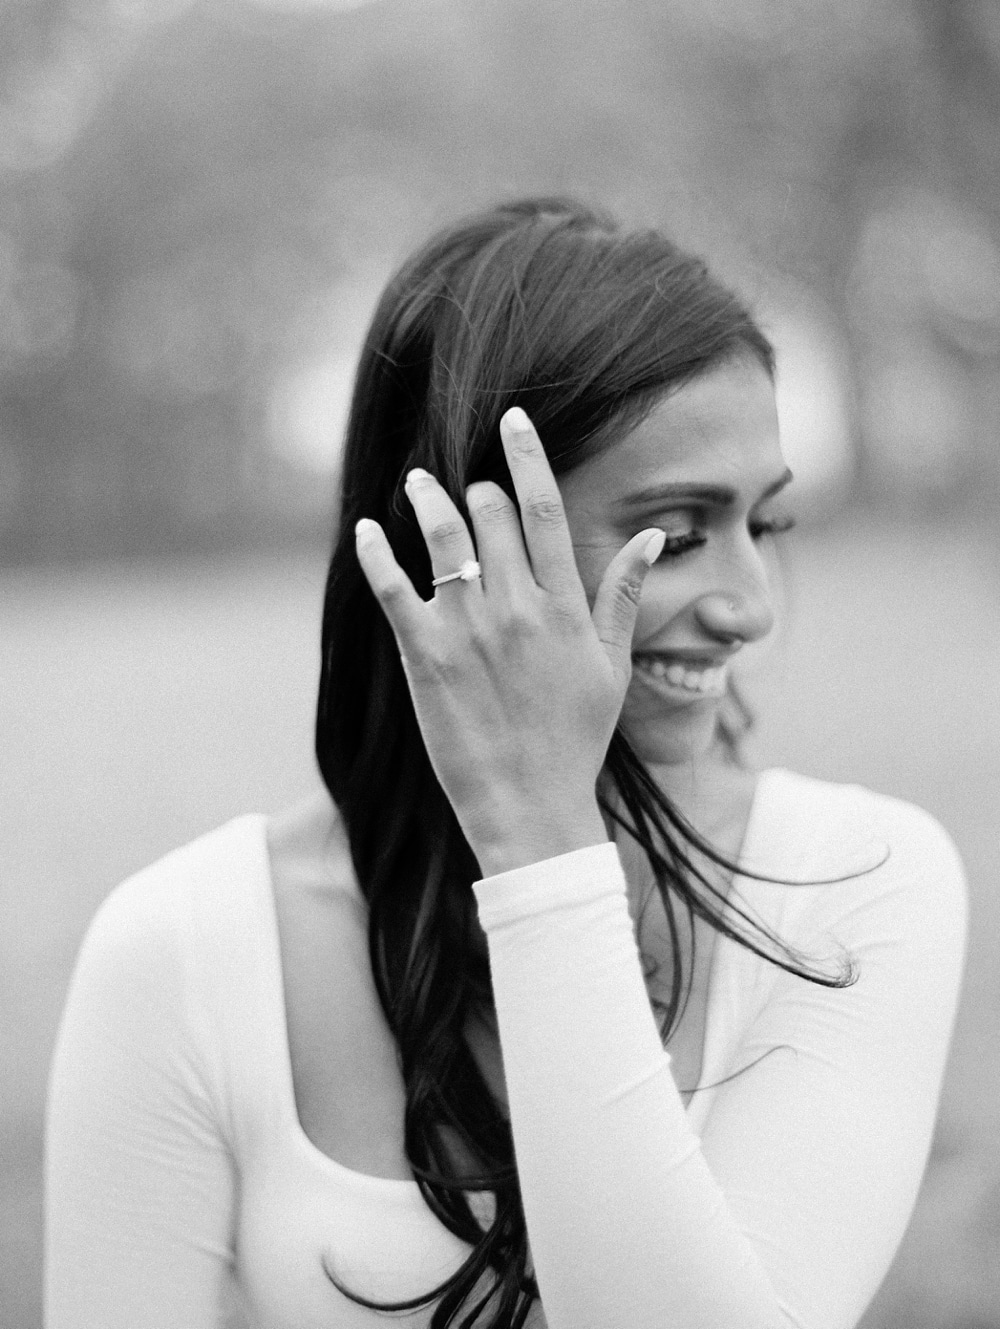 Kristin-La-Voie-Photography-morton-arboretum-chicago-wedding-photographer-32